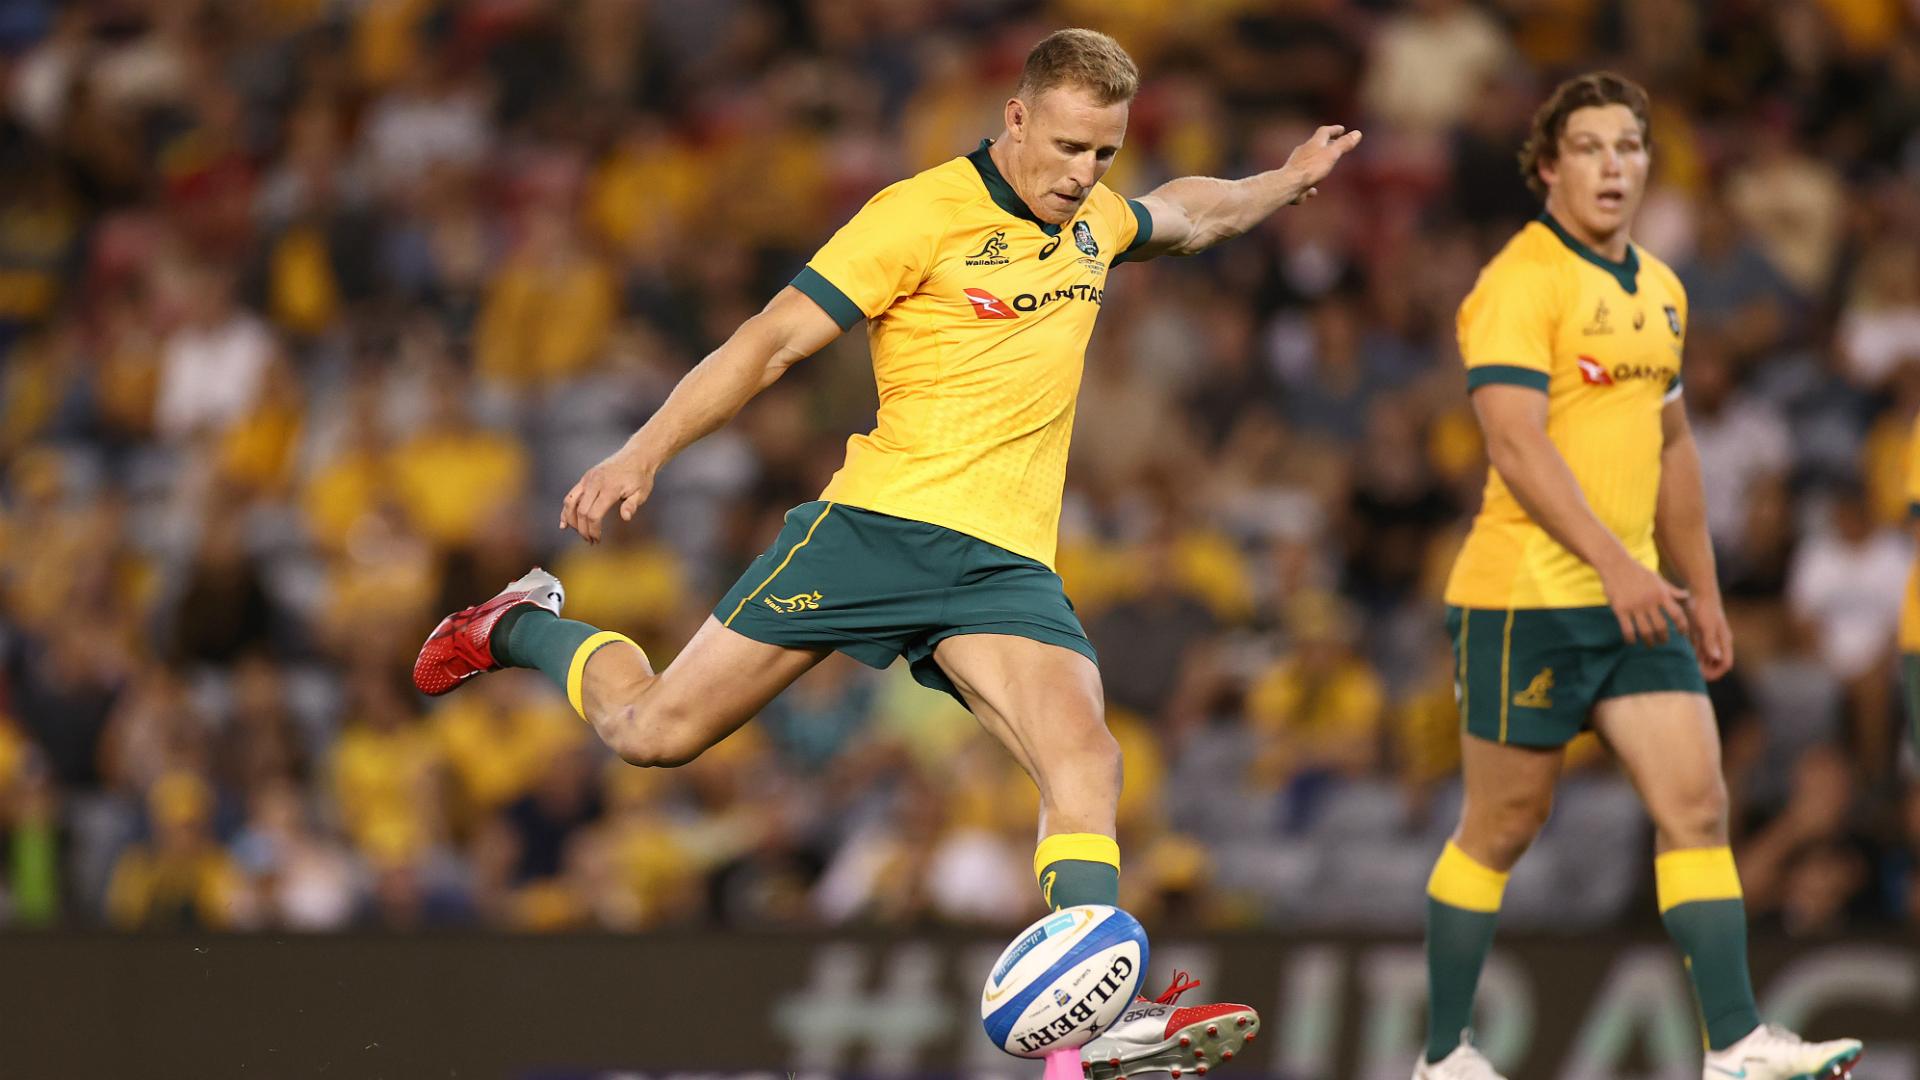 Argentina 15-15 Australia: Wallabies denied as Hodge fluffs late penalty chance